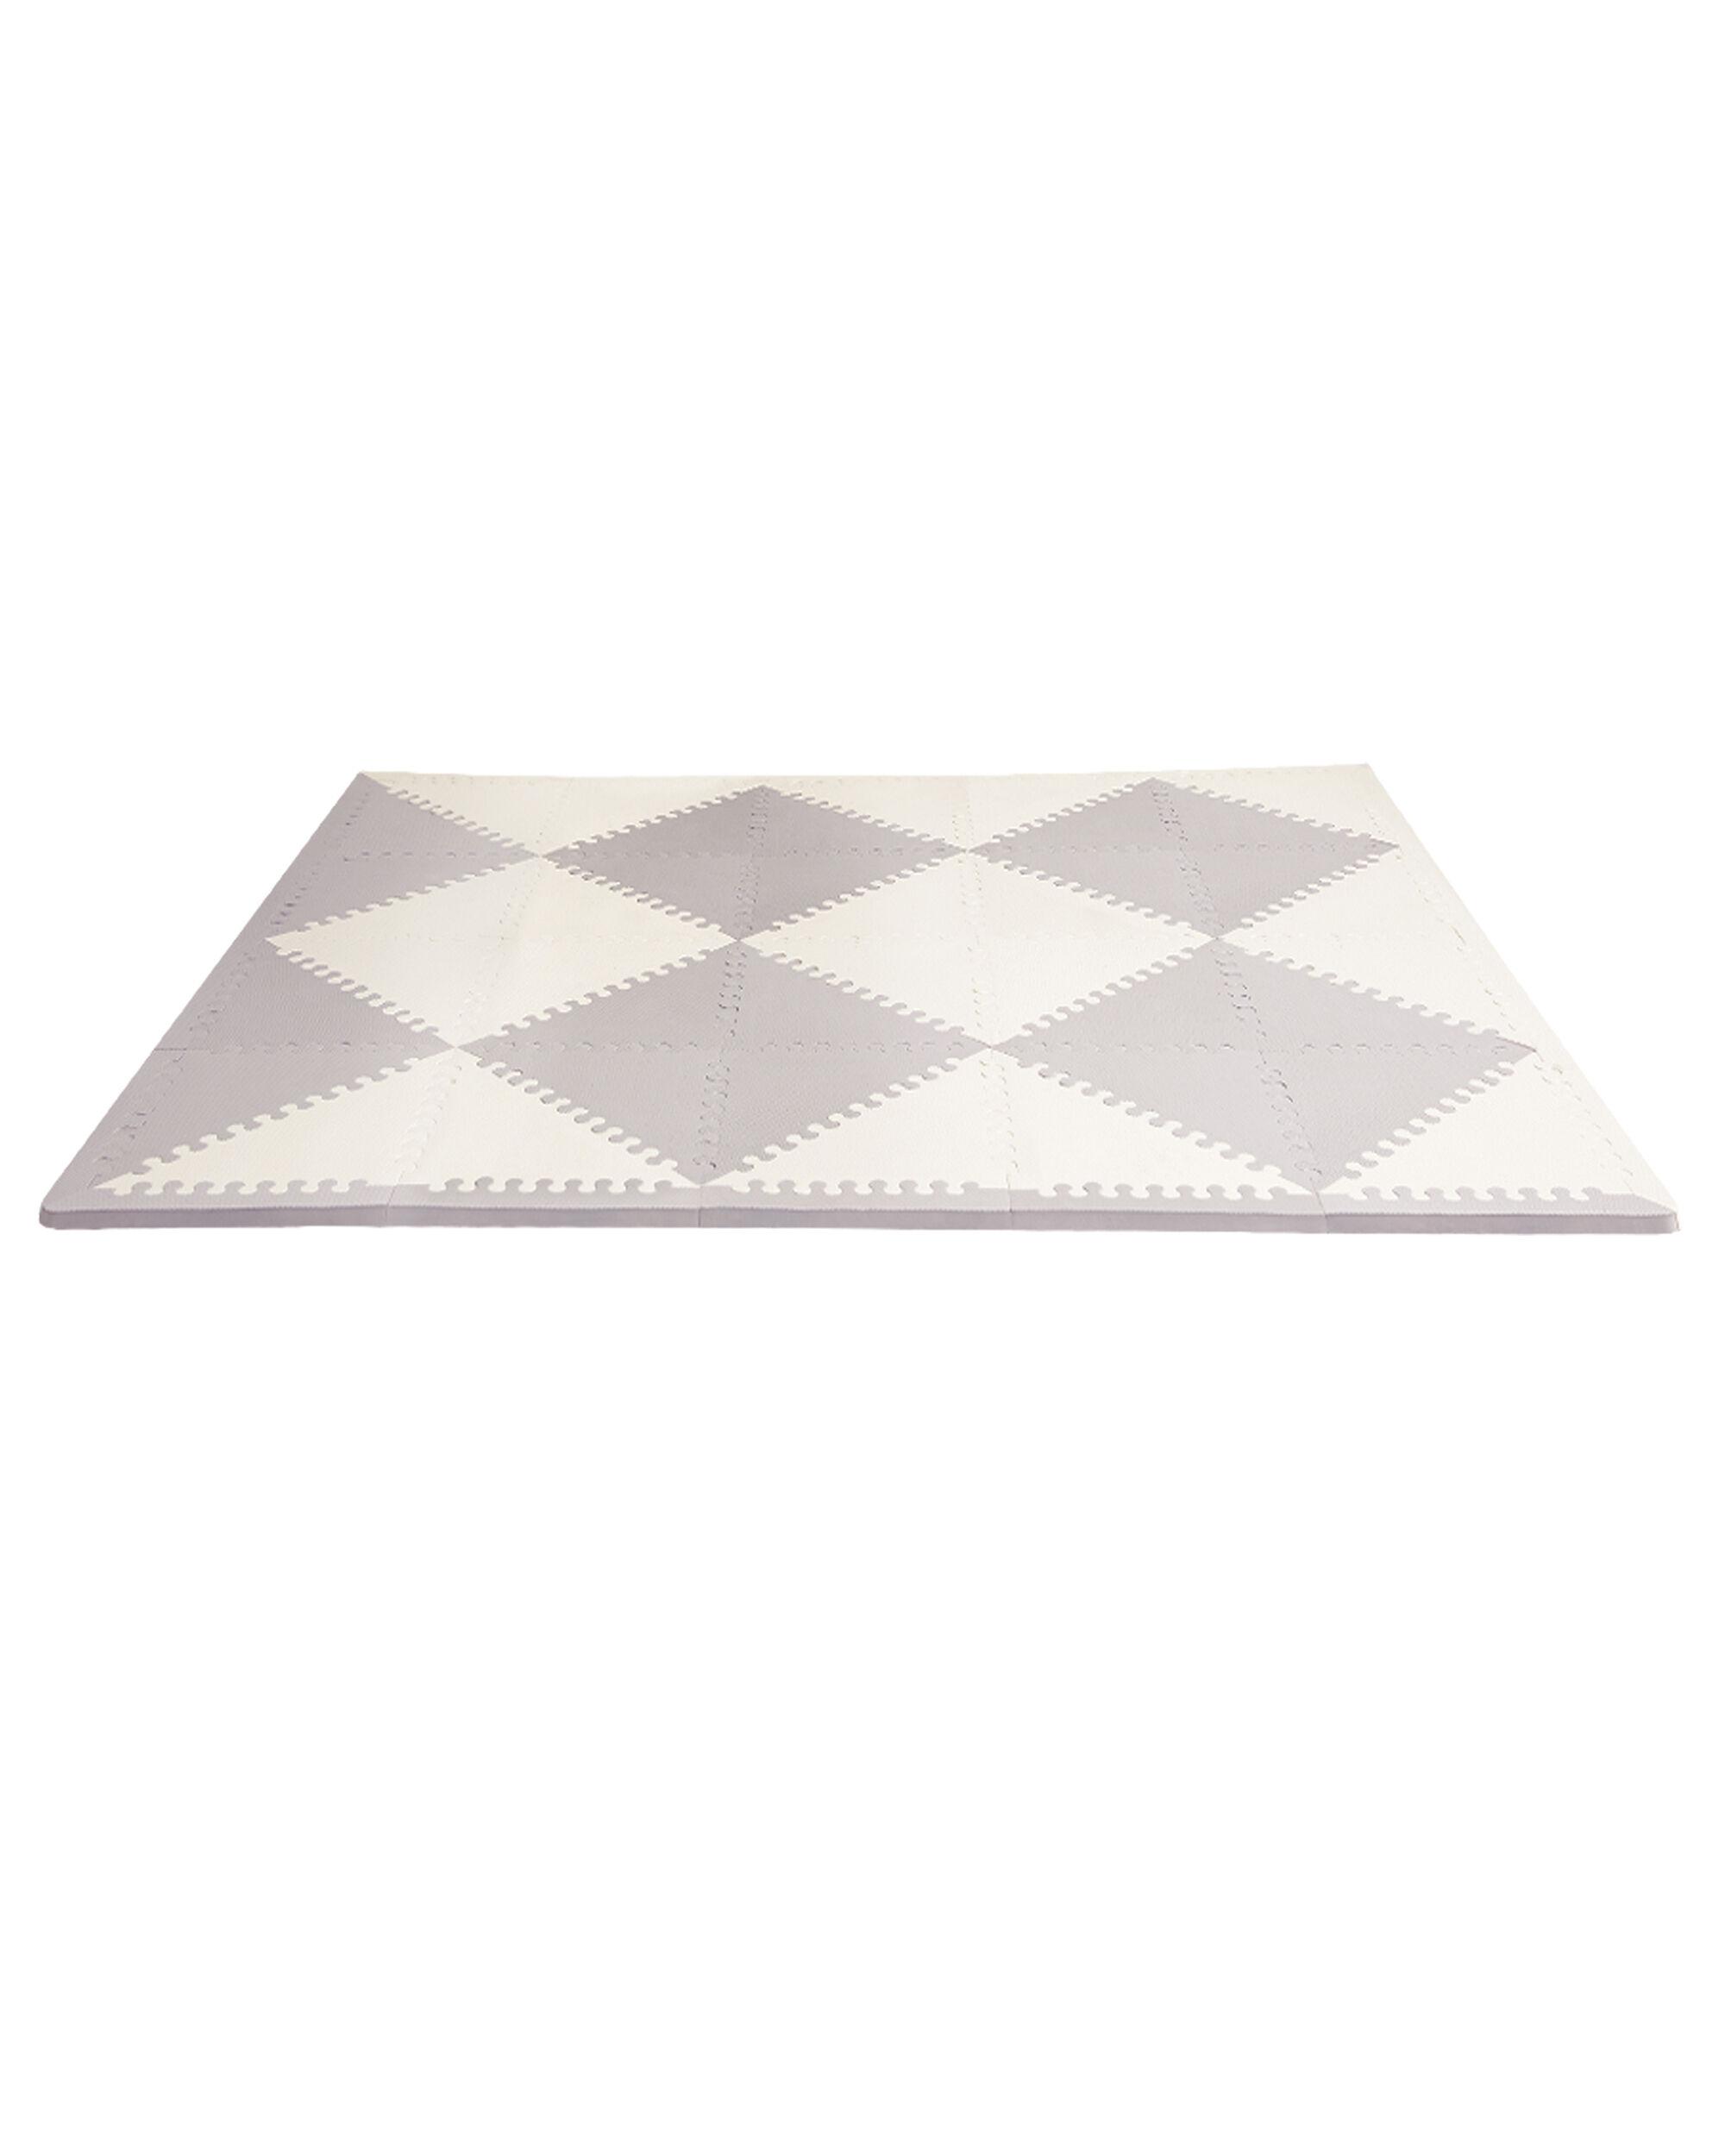 Delighted 12 Ceramic Tile Thin 12X12 Tin Ceiling Tiles Solid 4X8 Subway Tile 8X8 Ceramic Tile Old Adhesive For Ceiling Tiles BlueAmerican Olean Ceramic Tile Foam Floor Tiles \u0026 Baby Floor Mats | Skip Hop | Free Shipping